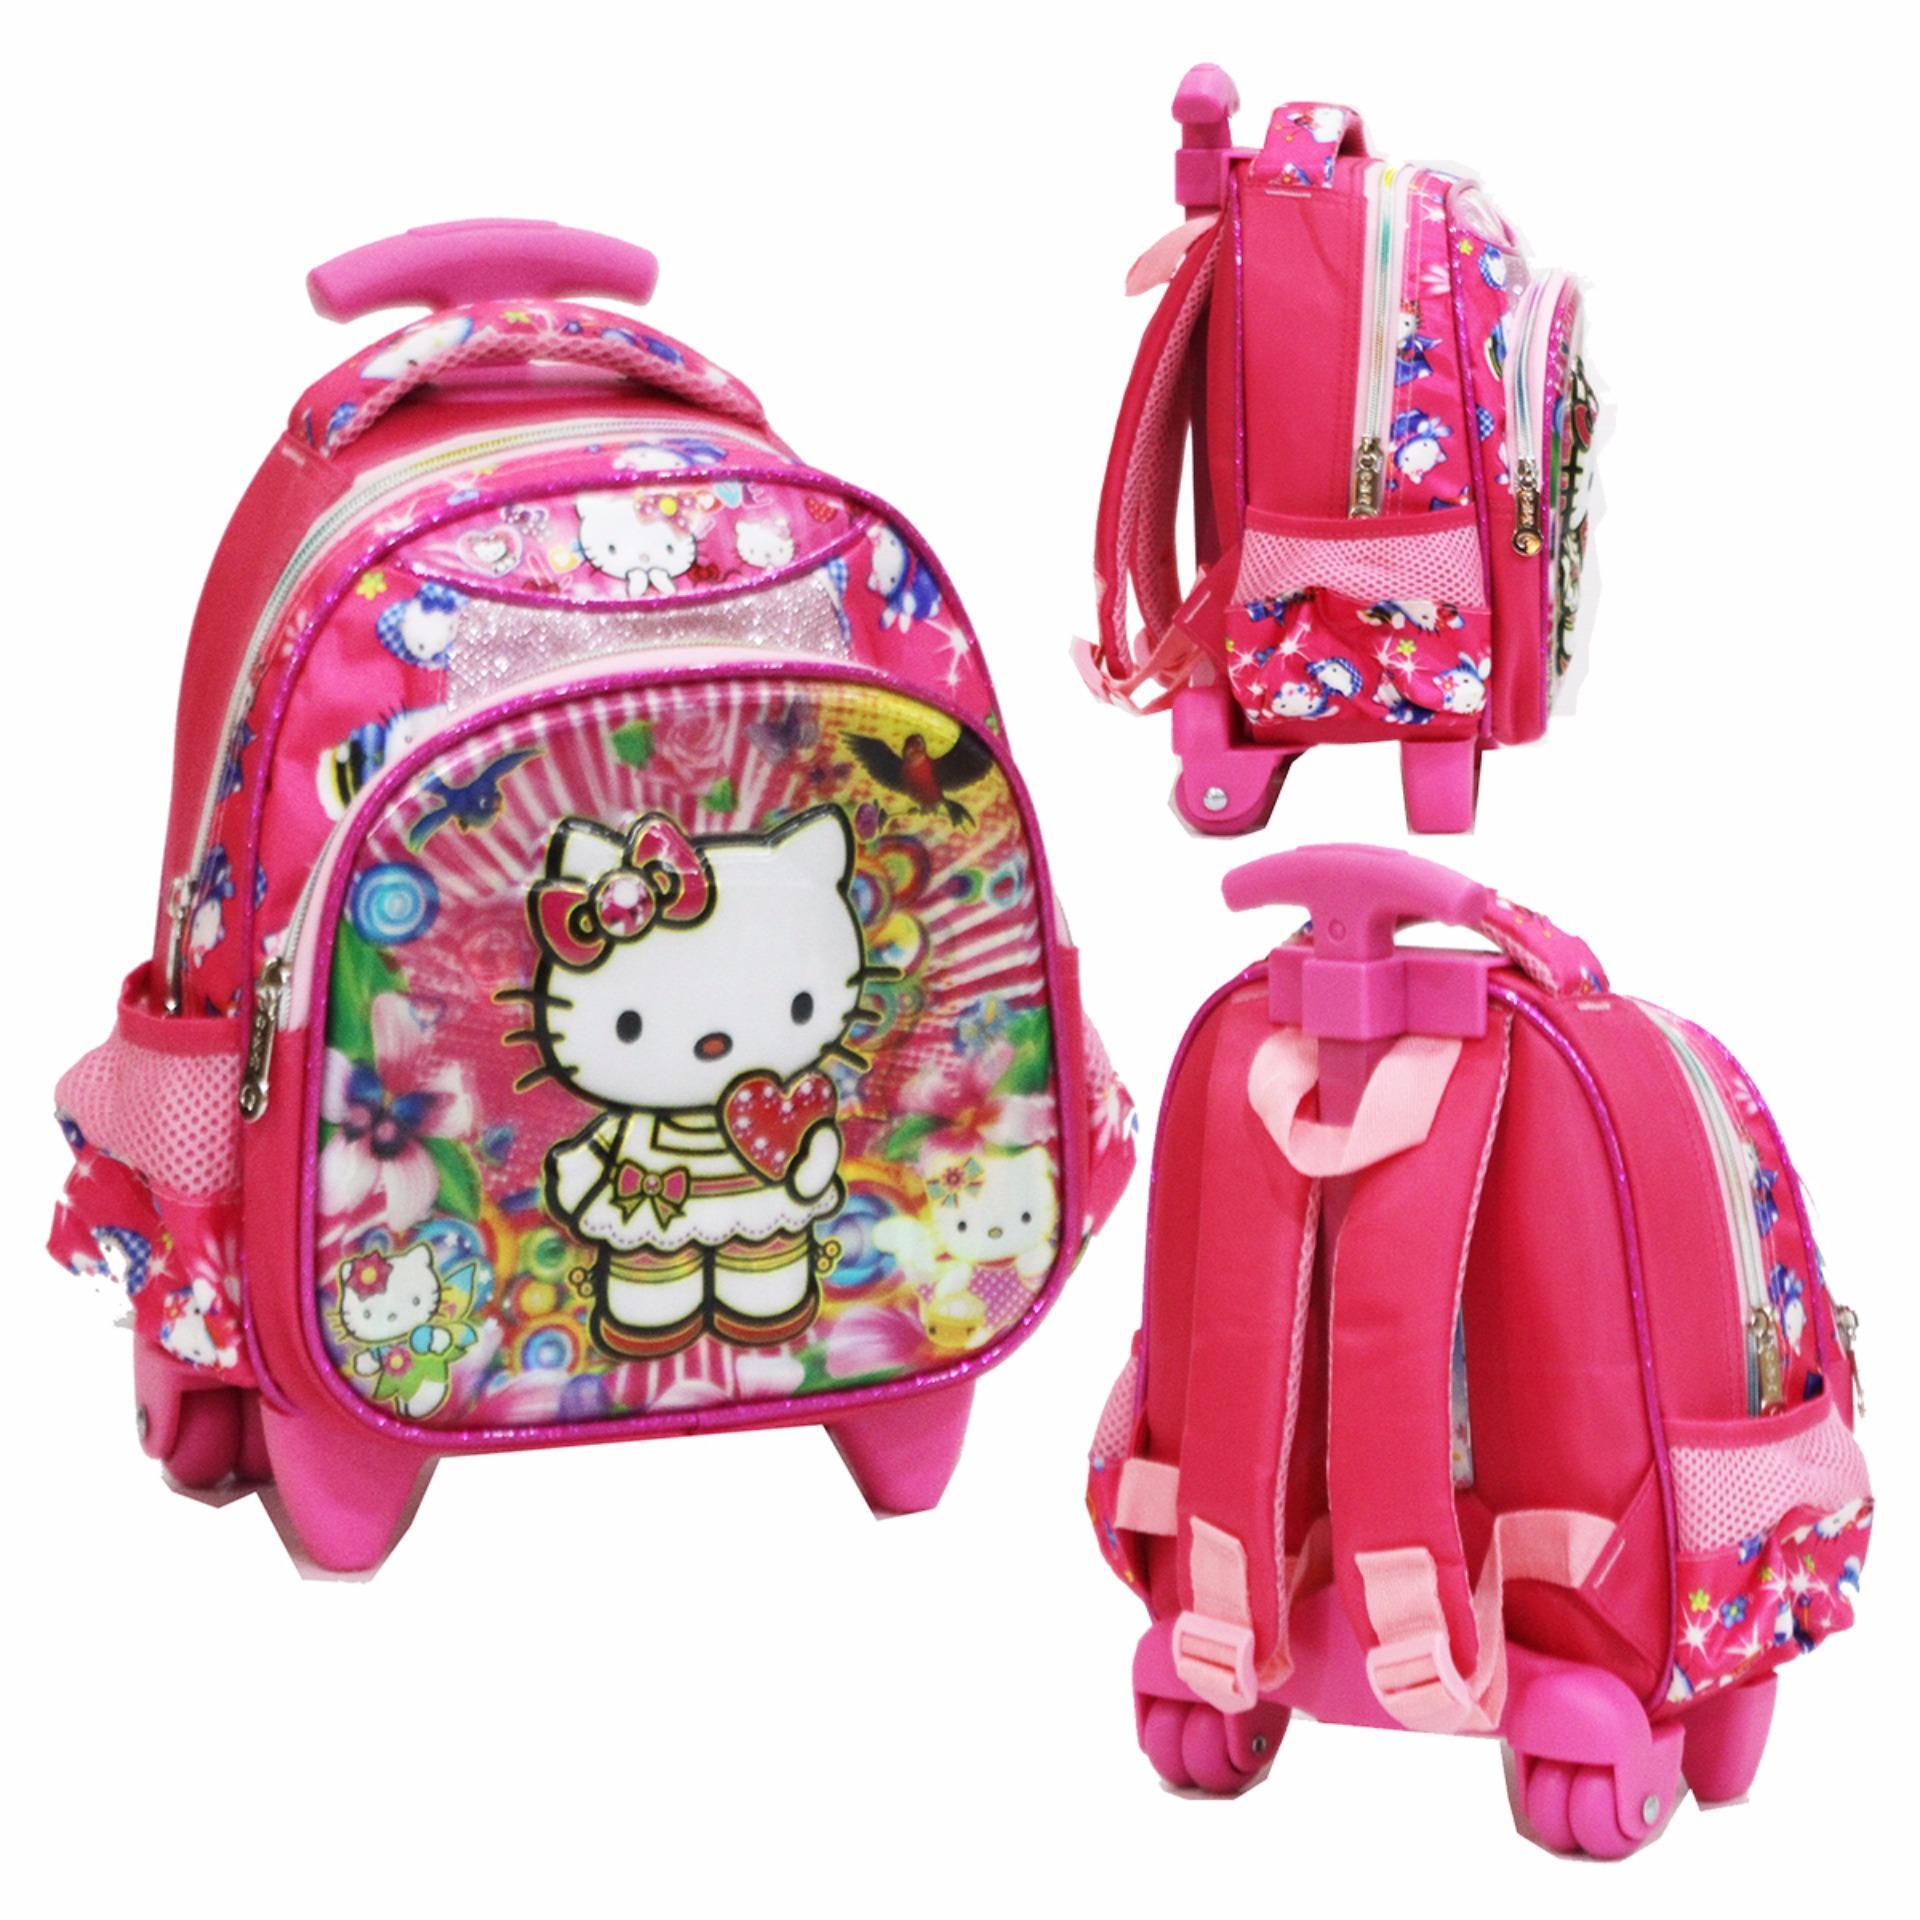 Beli Onlan Tas Trolley Anak Sekolah Paut Karakter Hello Kitty Cantik 5D Timbul Hologram Online Dki Jakarta